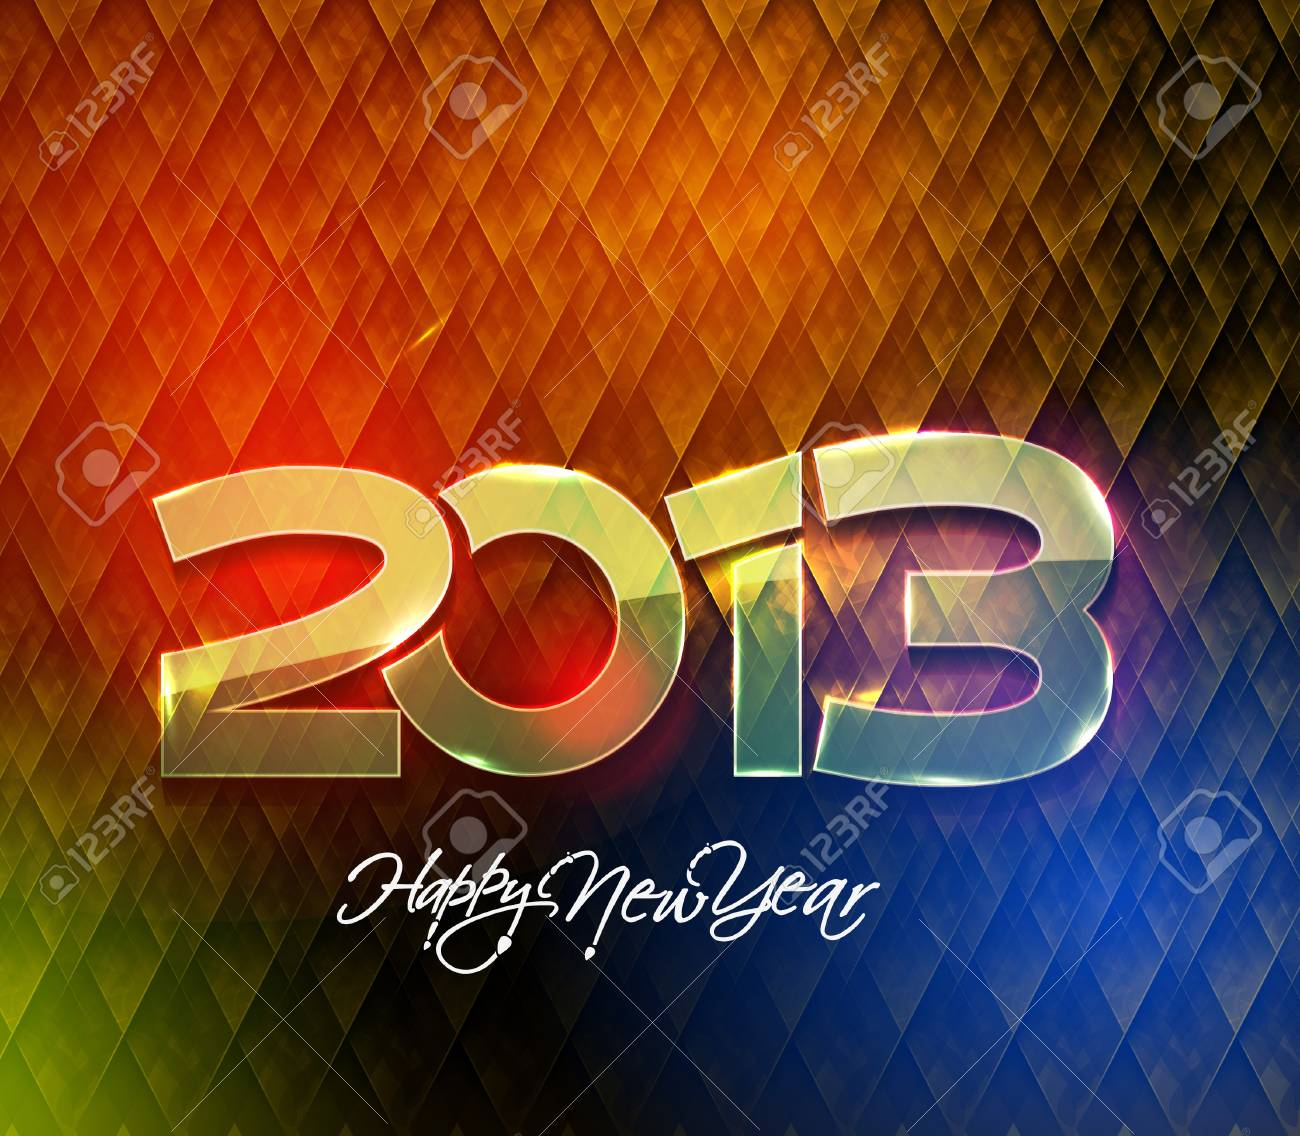 Happy new year 2013 celebration design. Stock Vector - 16818660